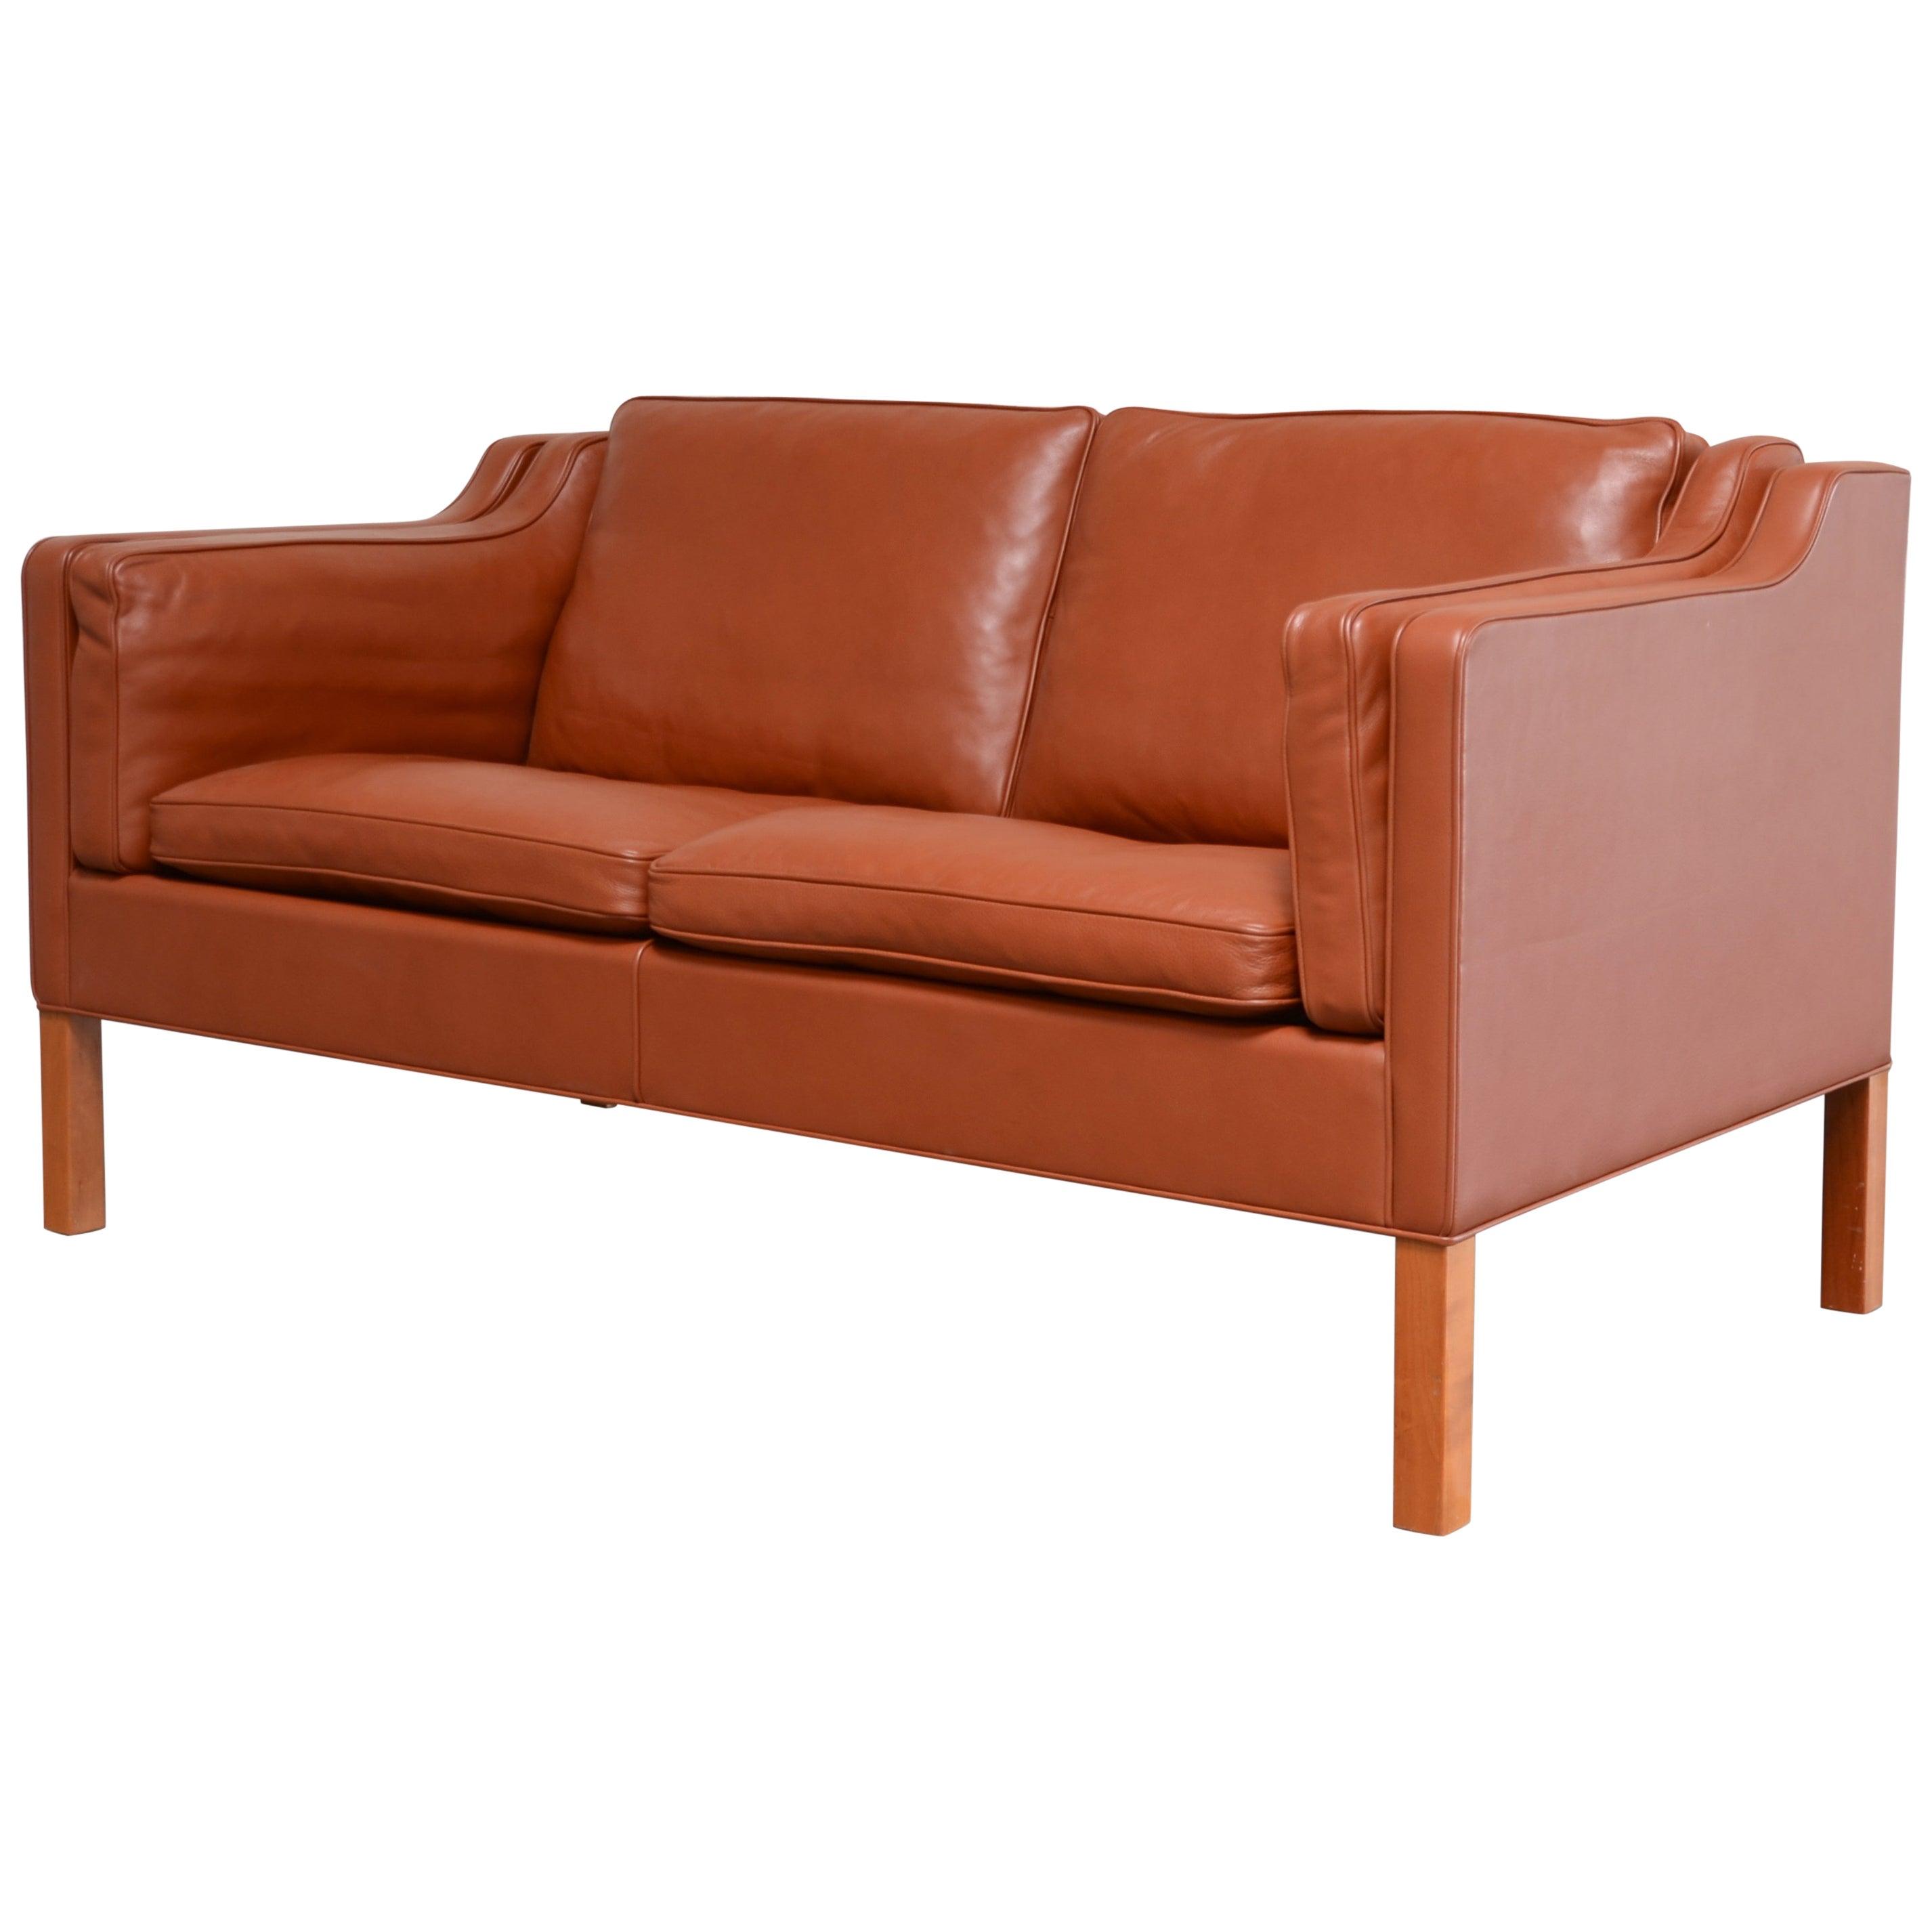 Borge Mogensen Leather Sofa Model 2212 Red Brandy Cognac for Fredericia